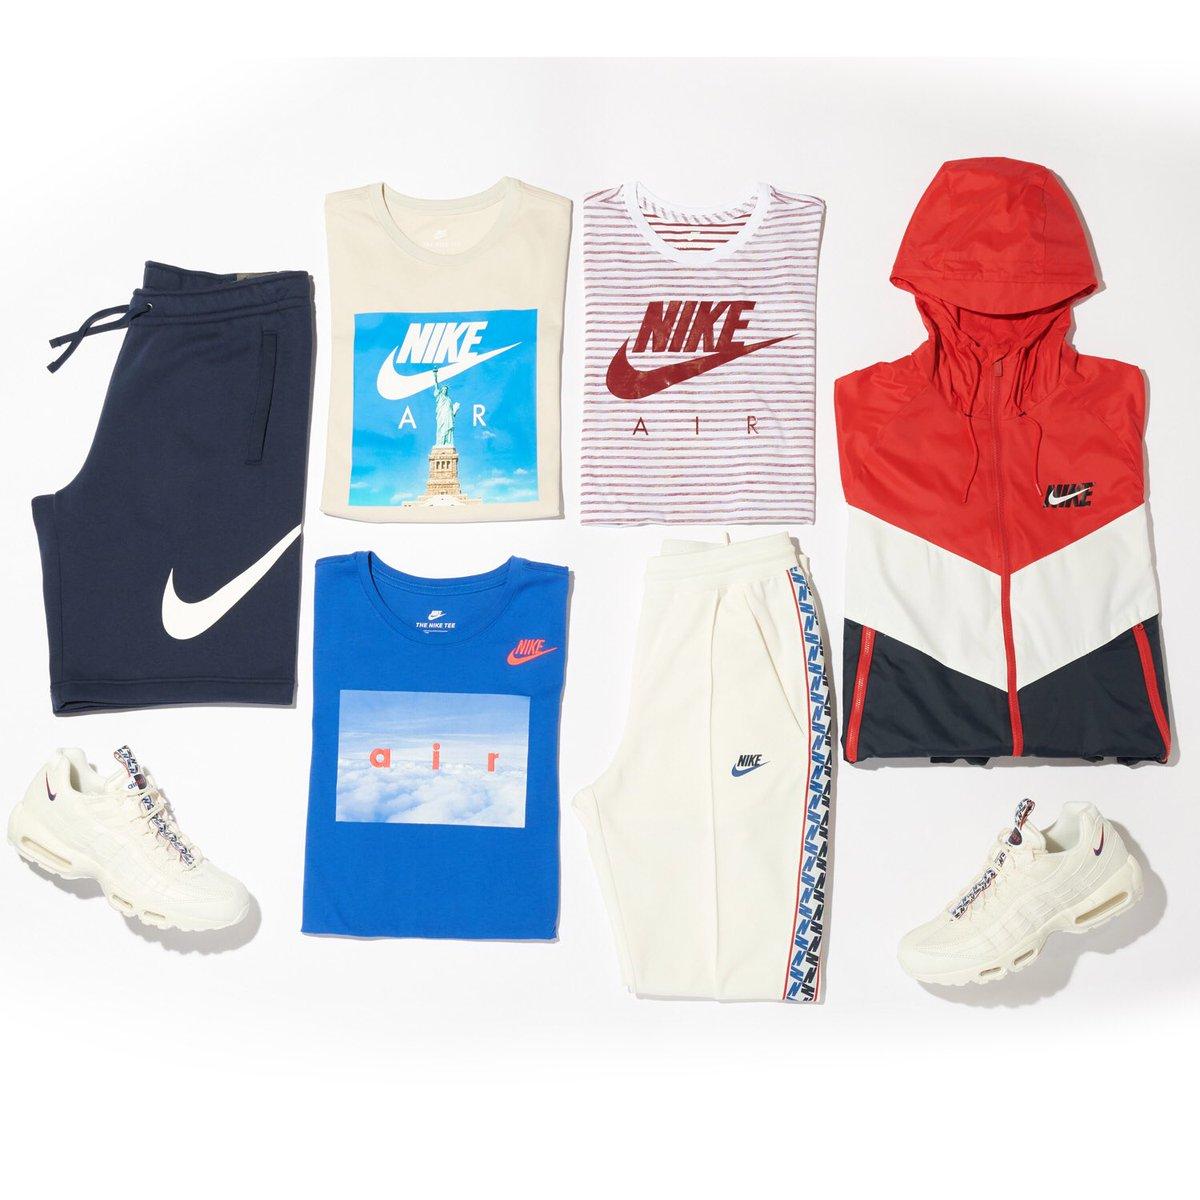 premium selection c78e2 ead5a Shop the latest Men s  nike Sportswear at Jimmy Jazz   nikeairpic.twitter.com d5I310KEL7